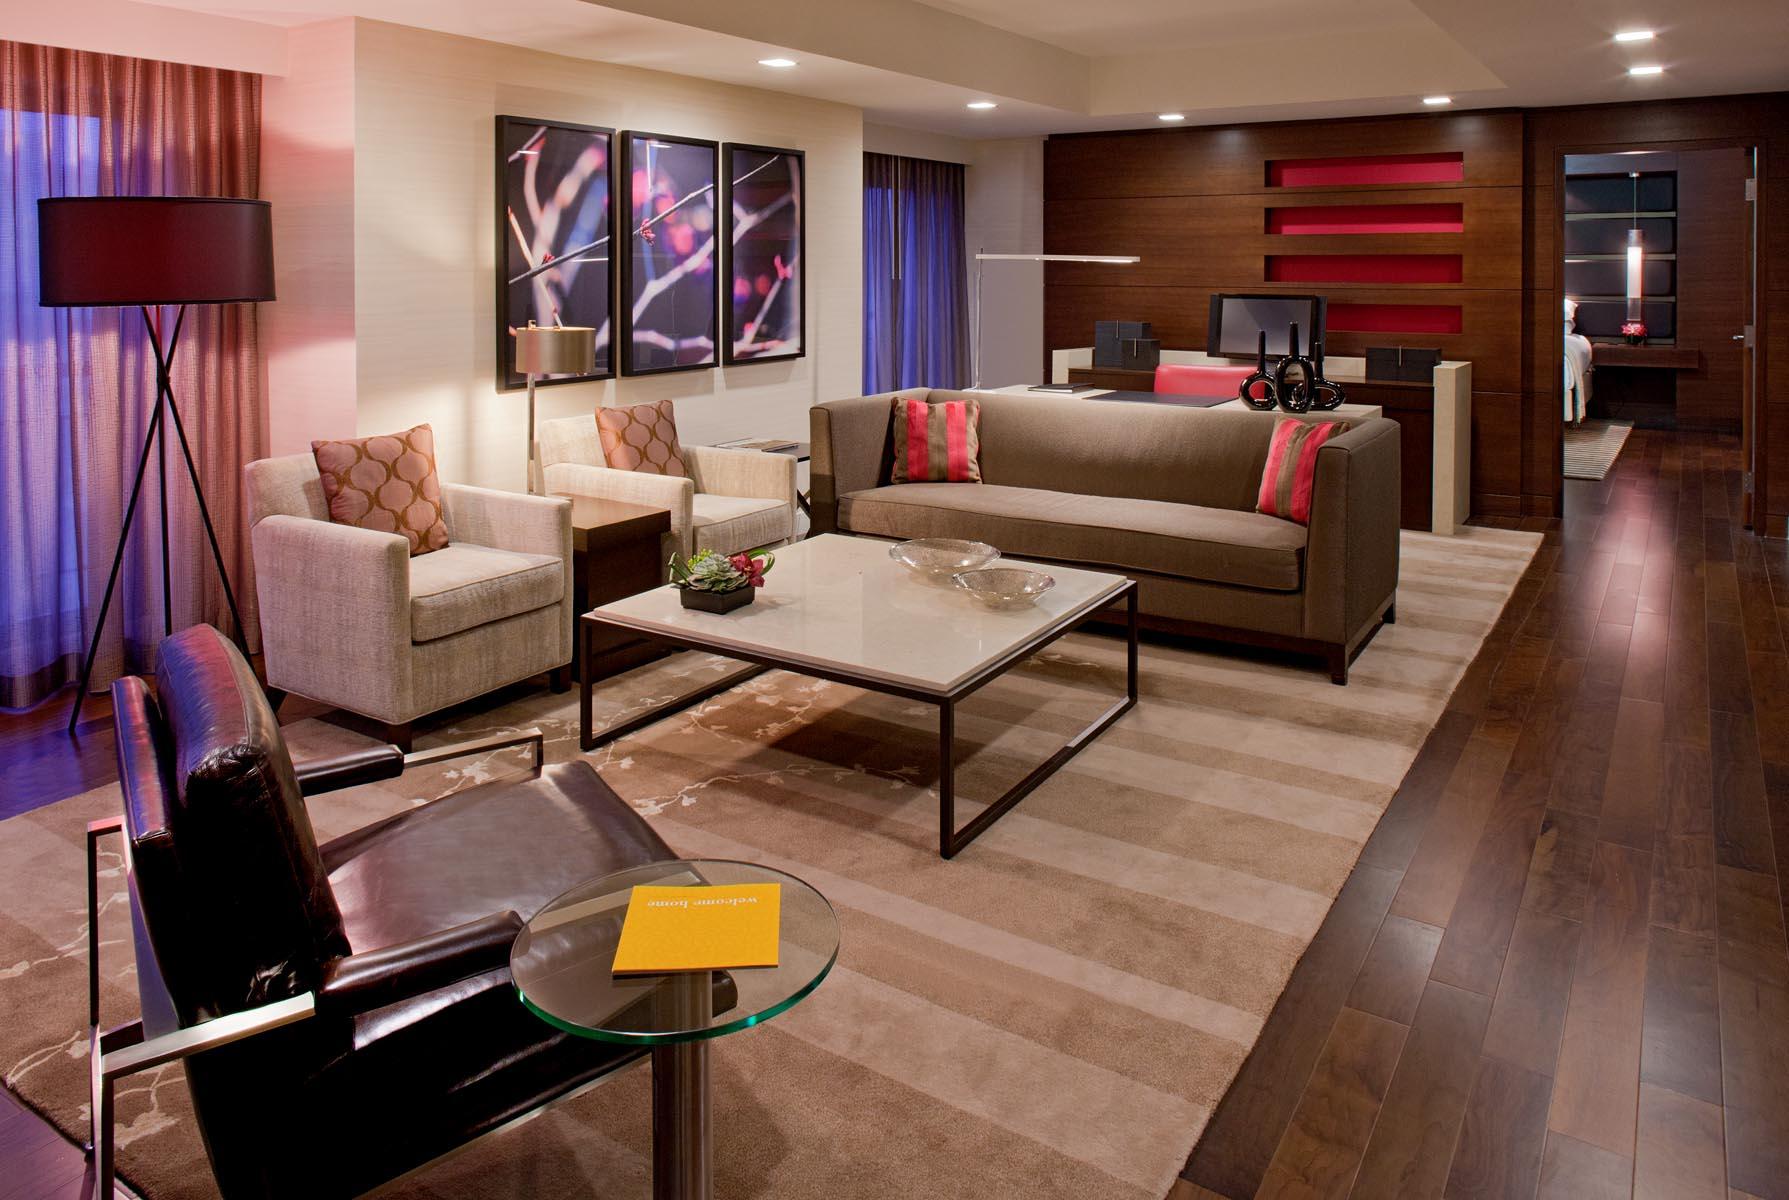 Grand hyatt washington announces inauguration weekend - Washington dc suites hotels 2 bedroom ...